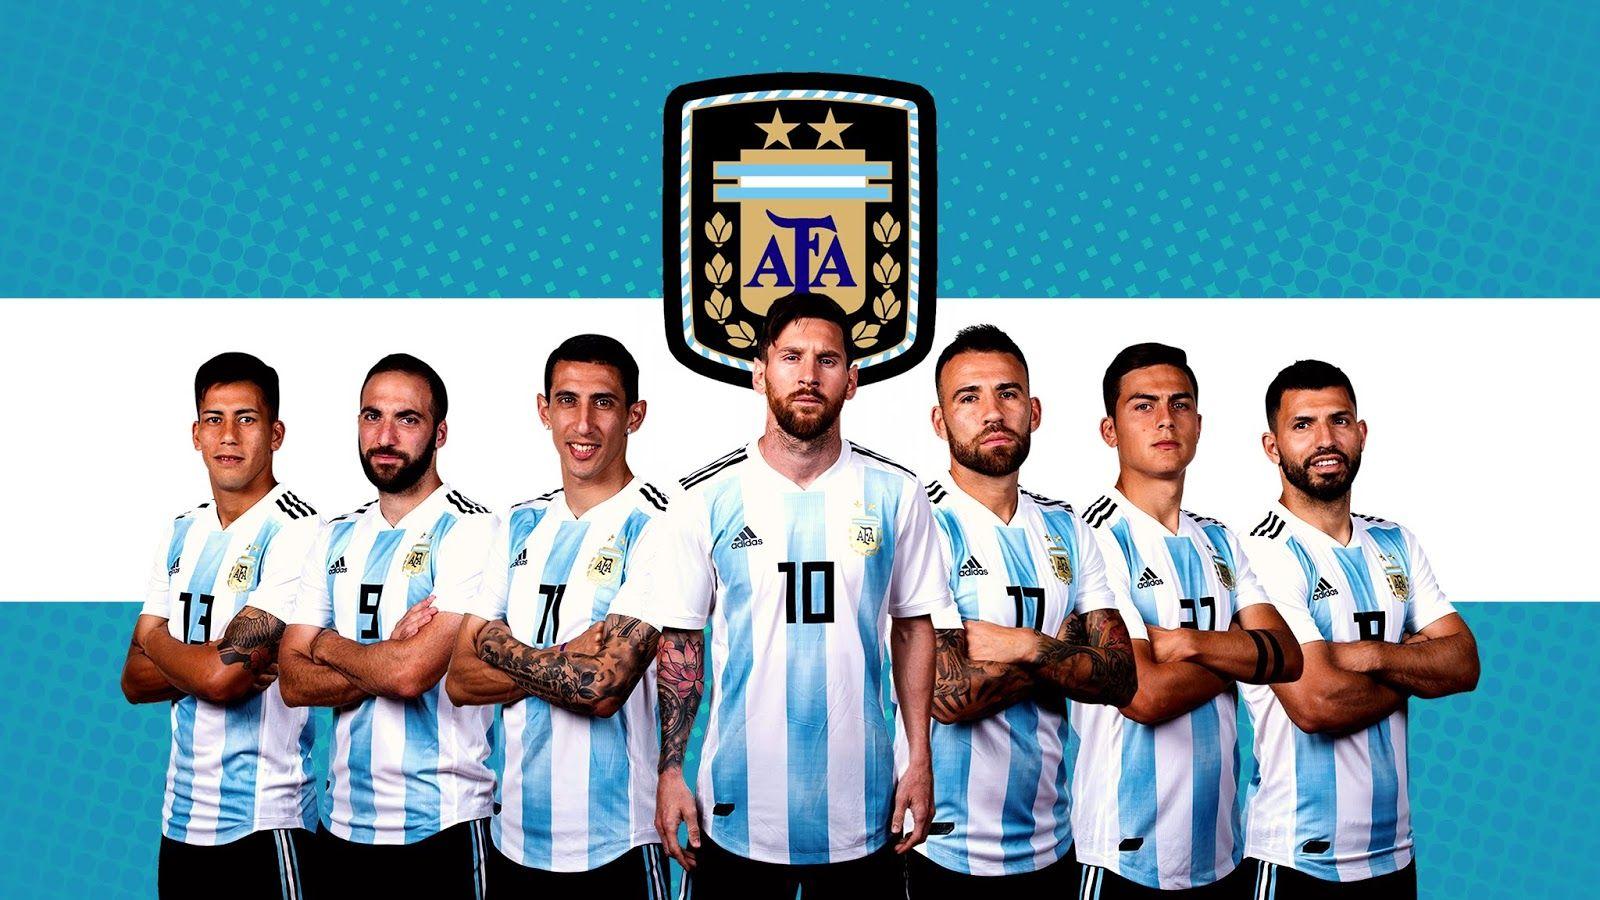 Argentina Football Association Lionel Messi 4k 5k Sports In 2020 Argentina Football Lionel Messi Argentina Team